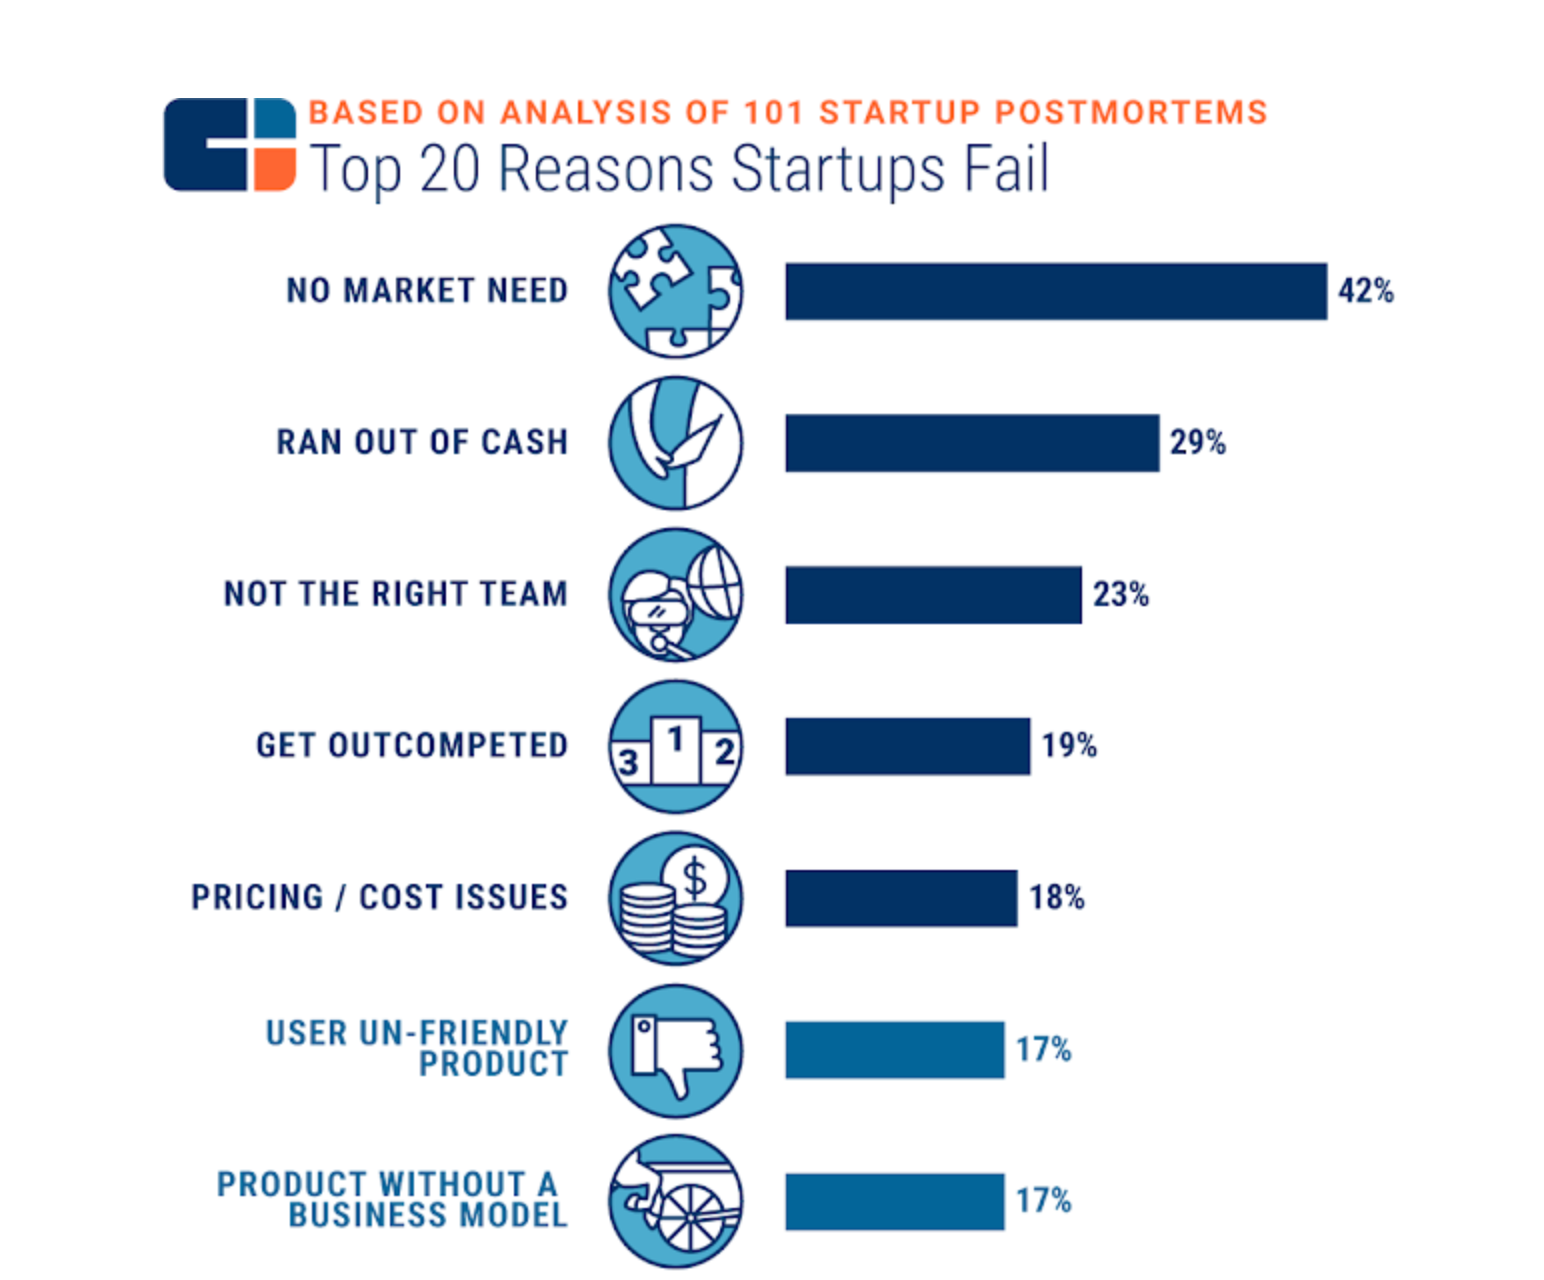 CB Insights - Top 20 Reasons Startups Fail